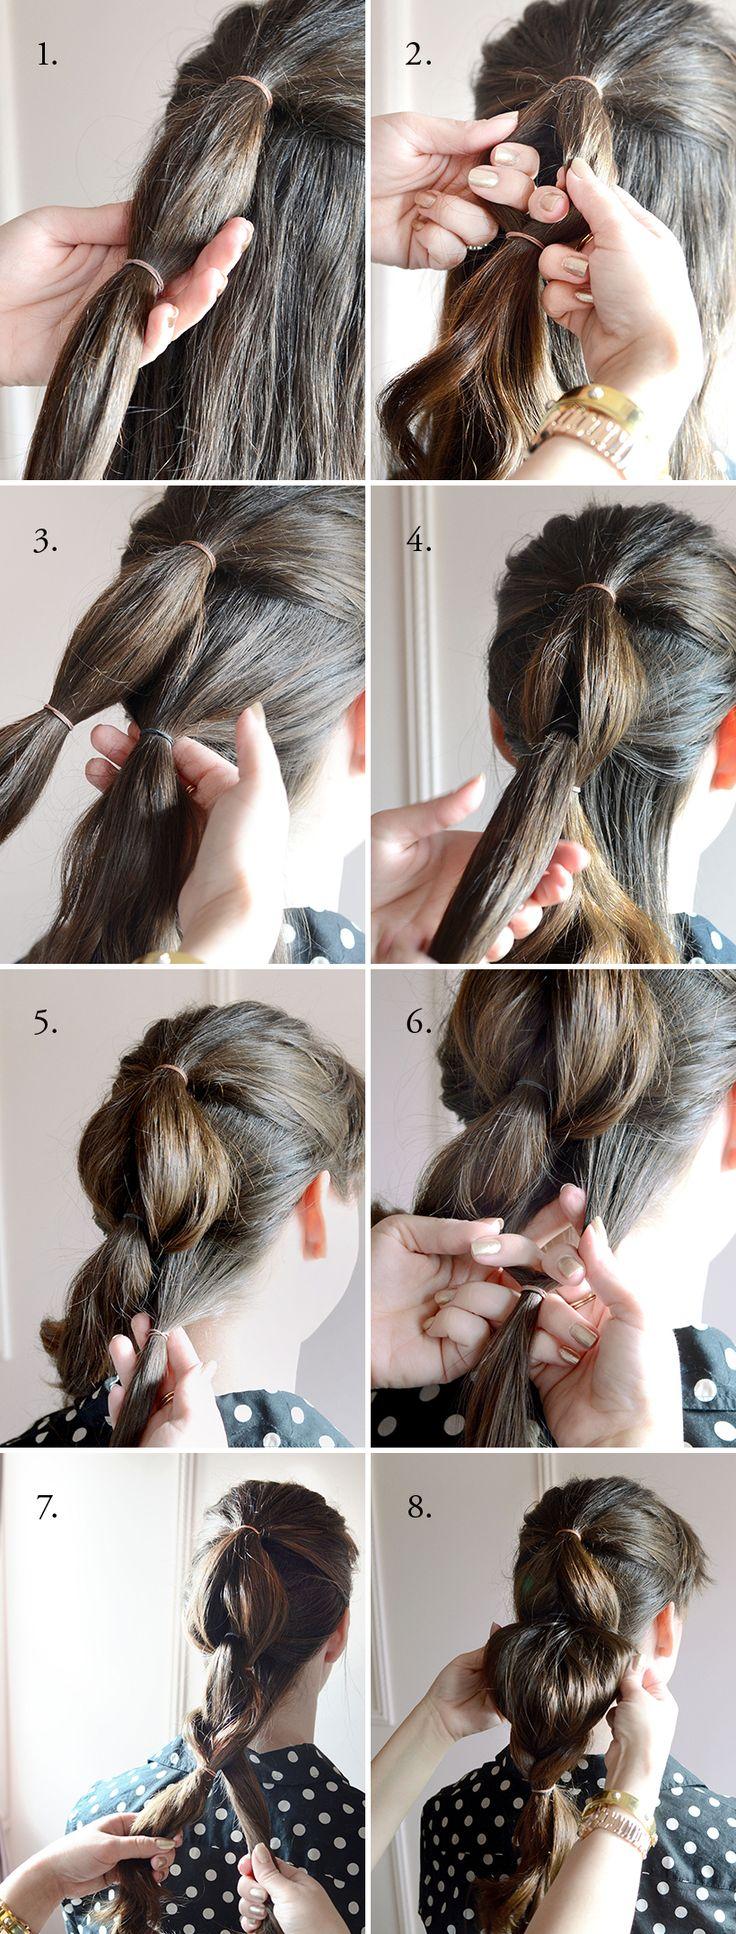 best 25+ rainy day hairstyles ideas on pinterest | hair tips rainy